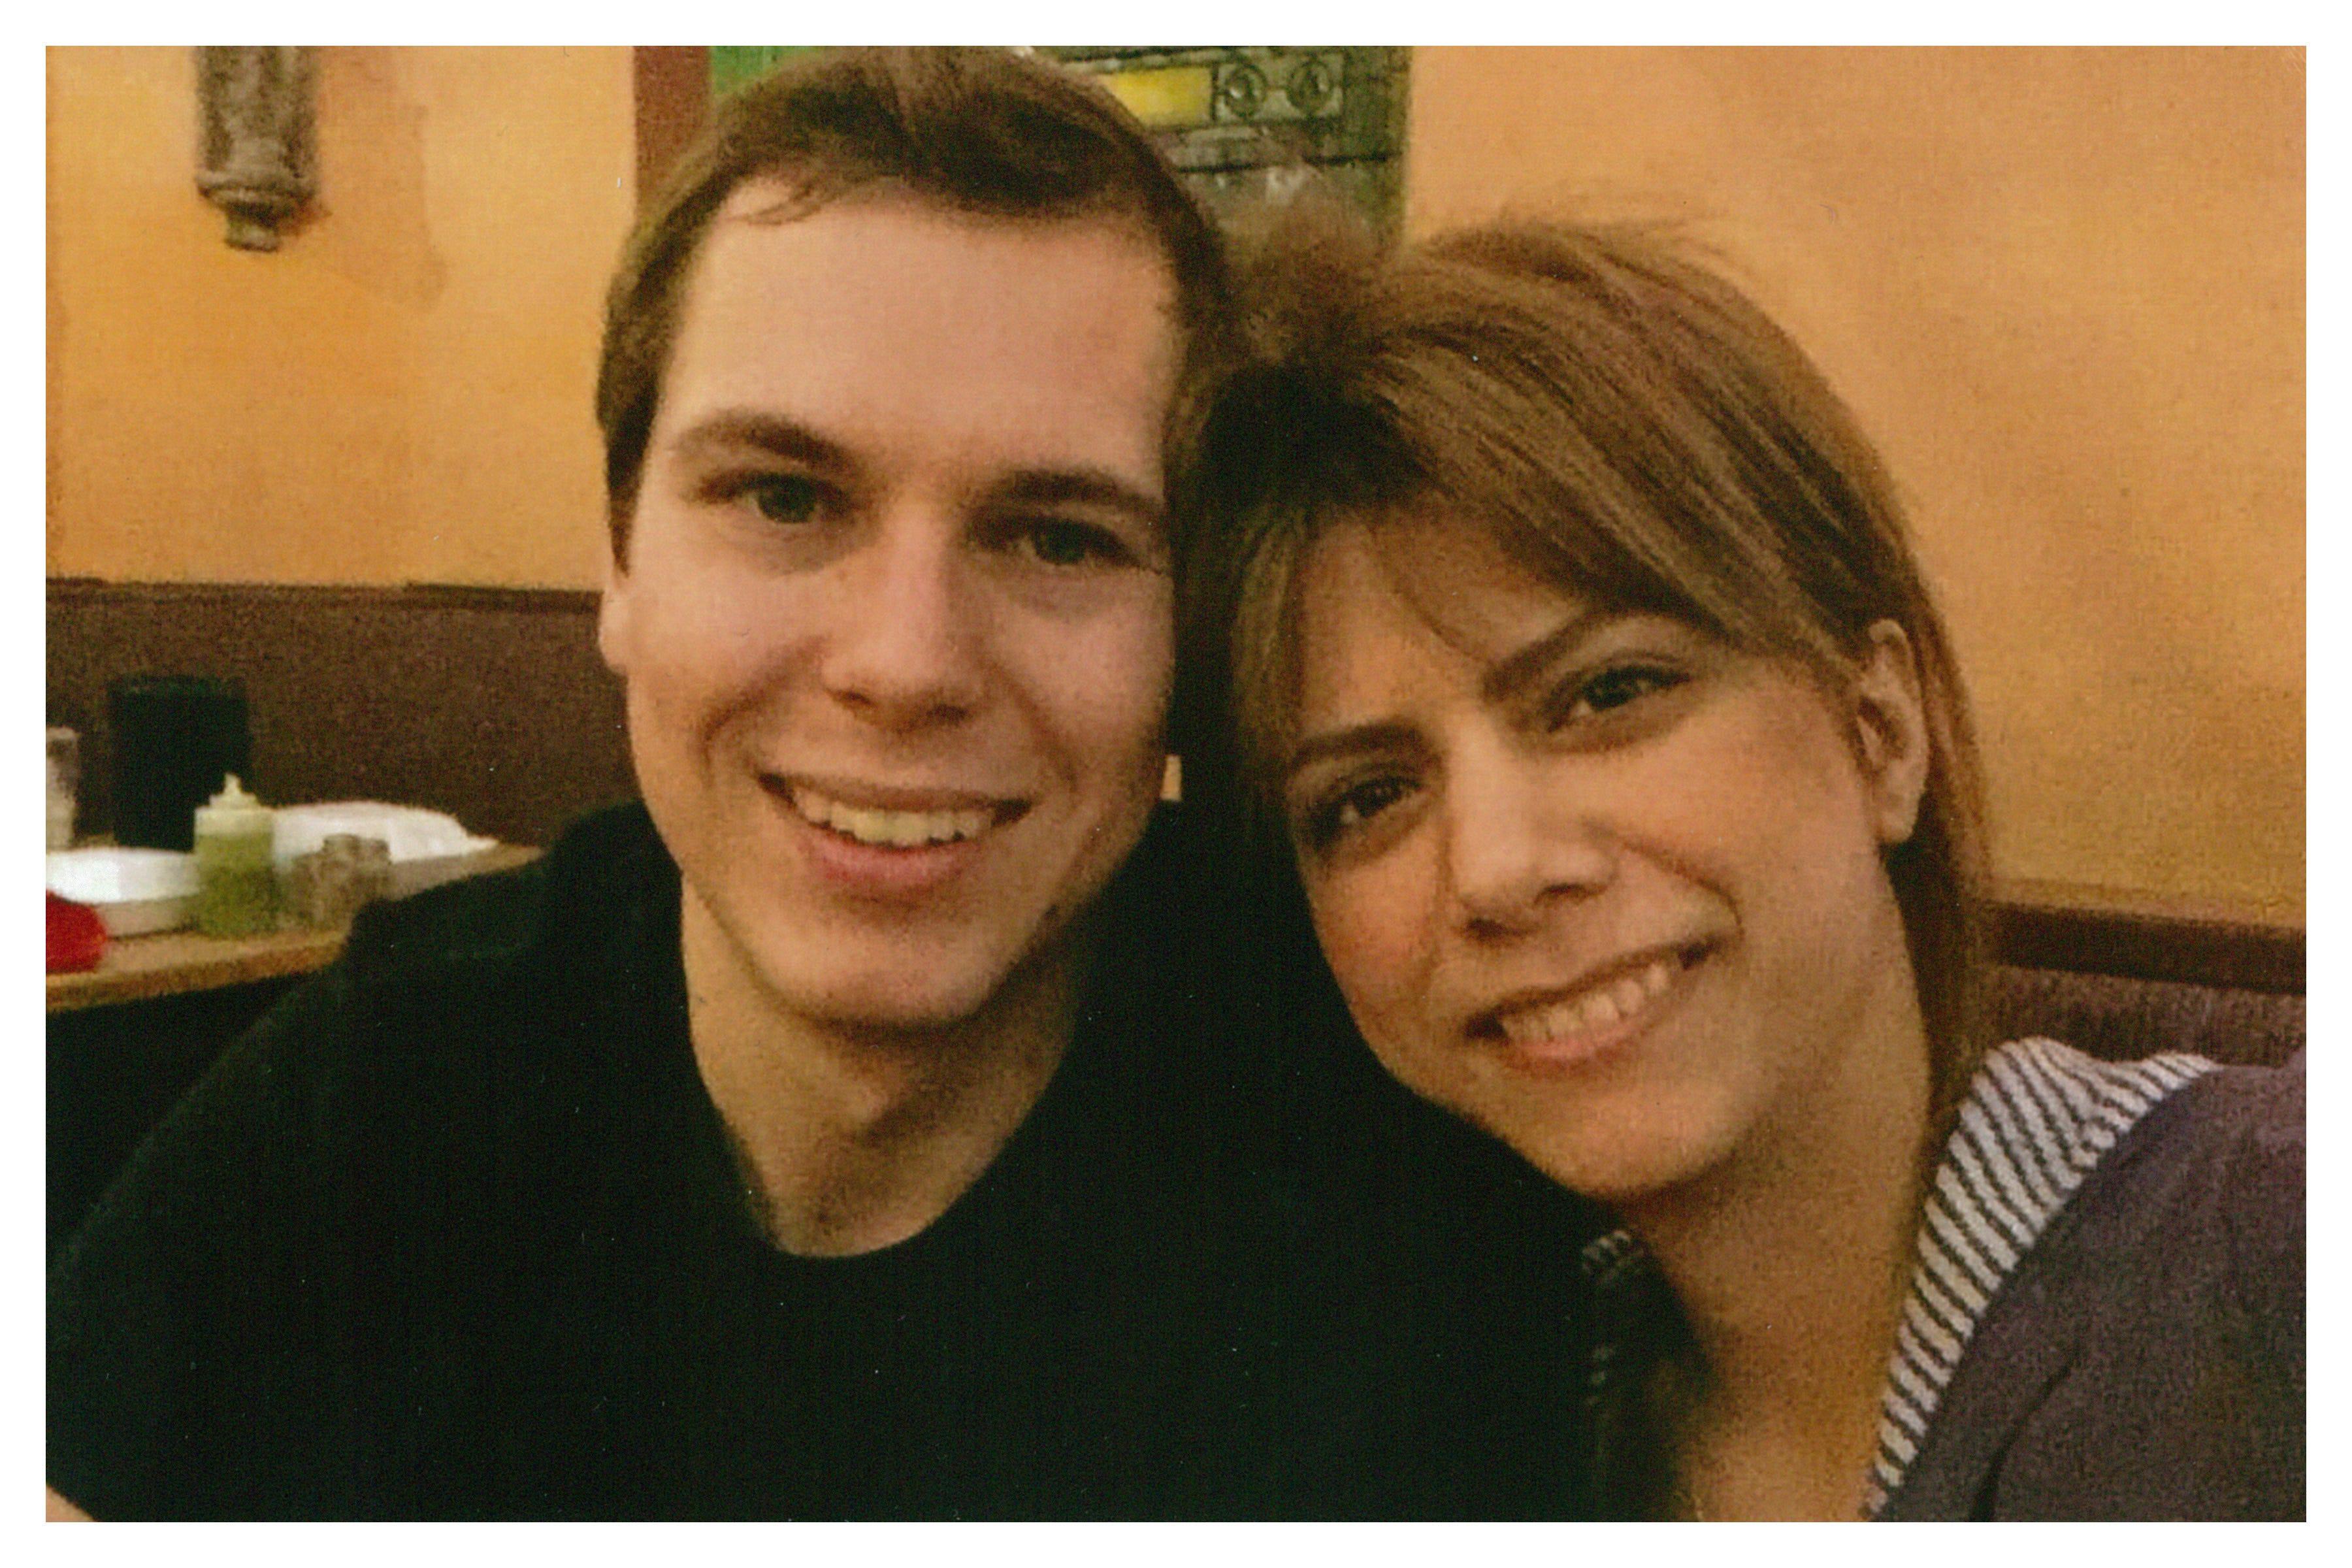 Trump's travel ban separates Lacey man and his Iranian bride